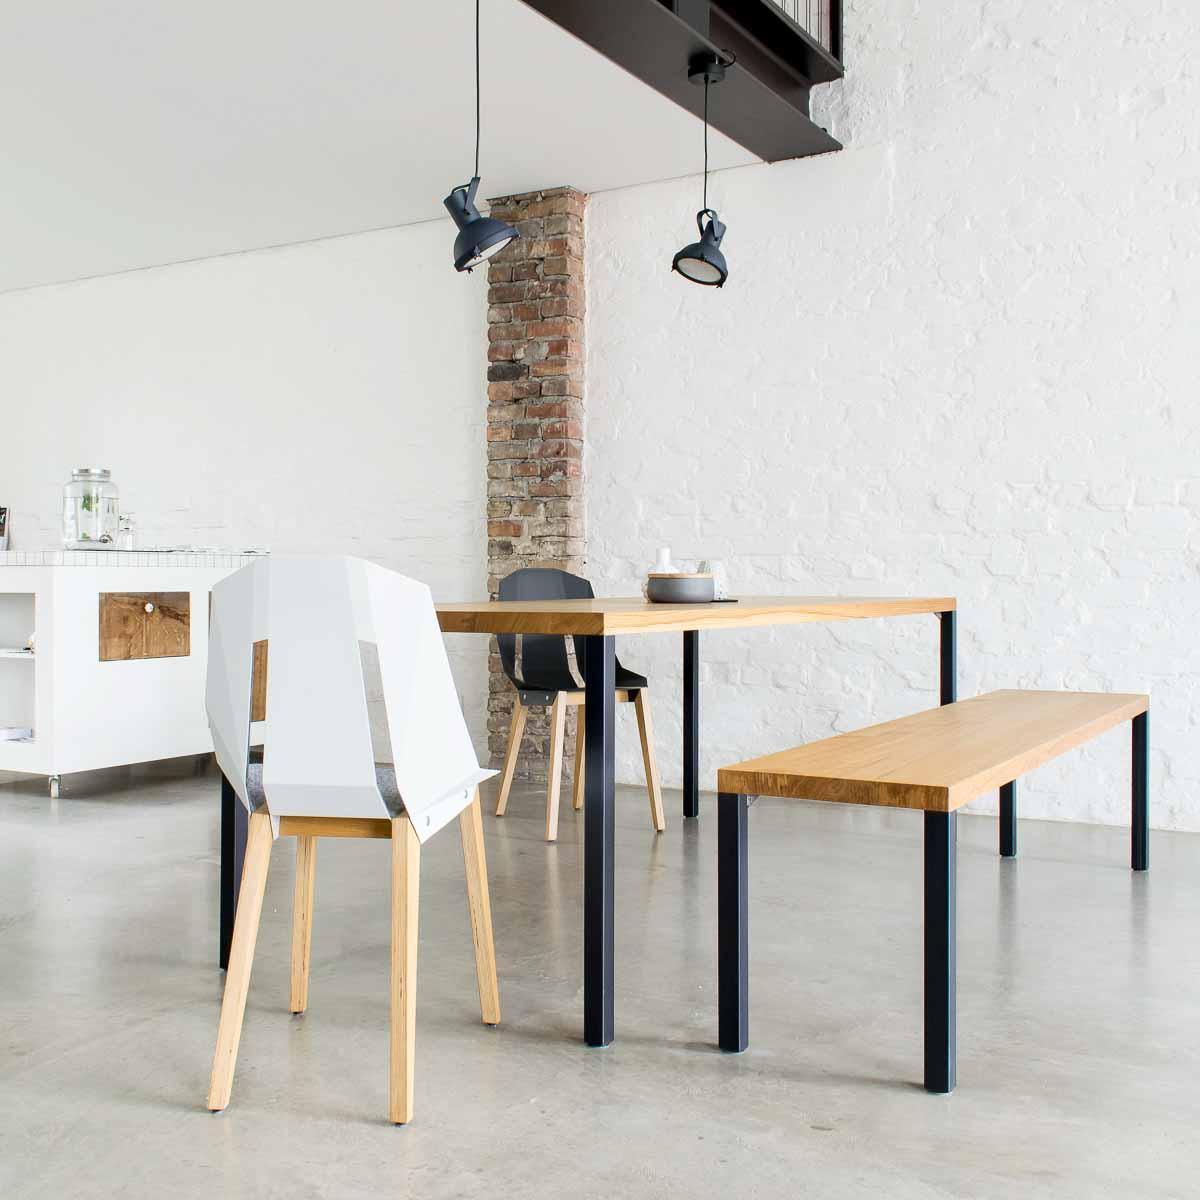 online mbel bestellen elegant mobel polen online kaufen mabel aus bestellen mbel in xmbel ihr. Black Bedroom Furniture Sets. Home Design Ideas